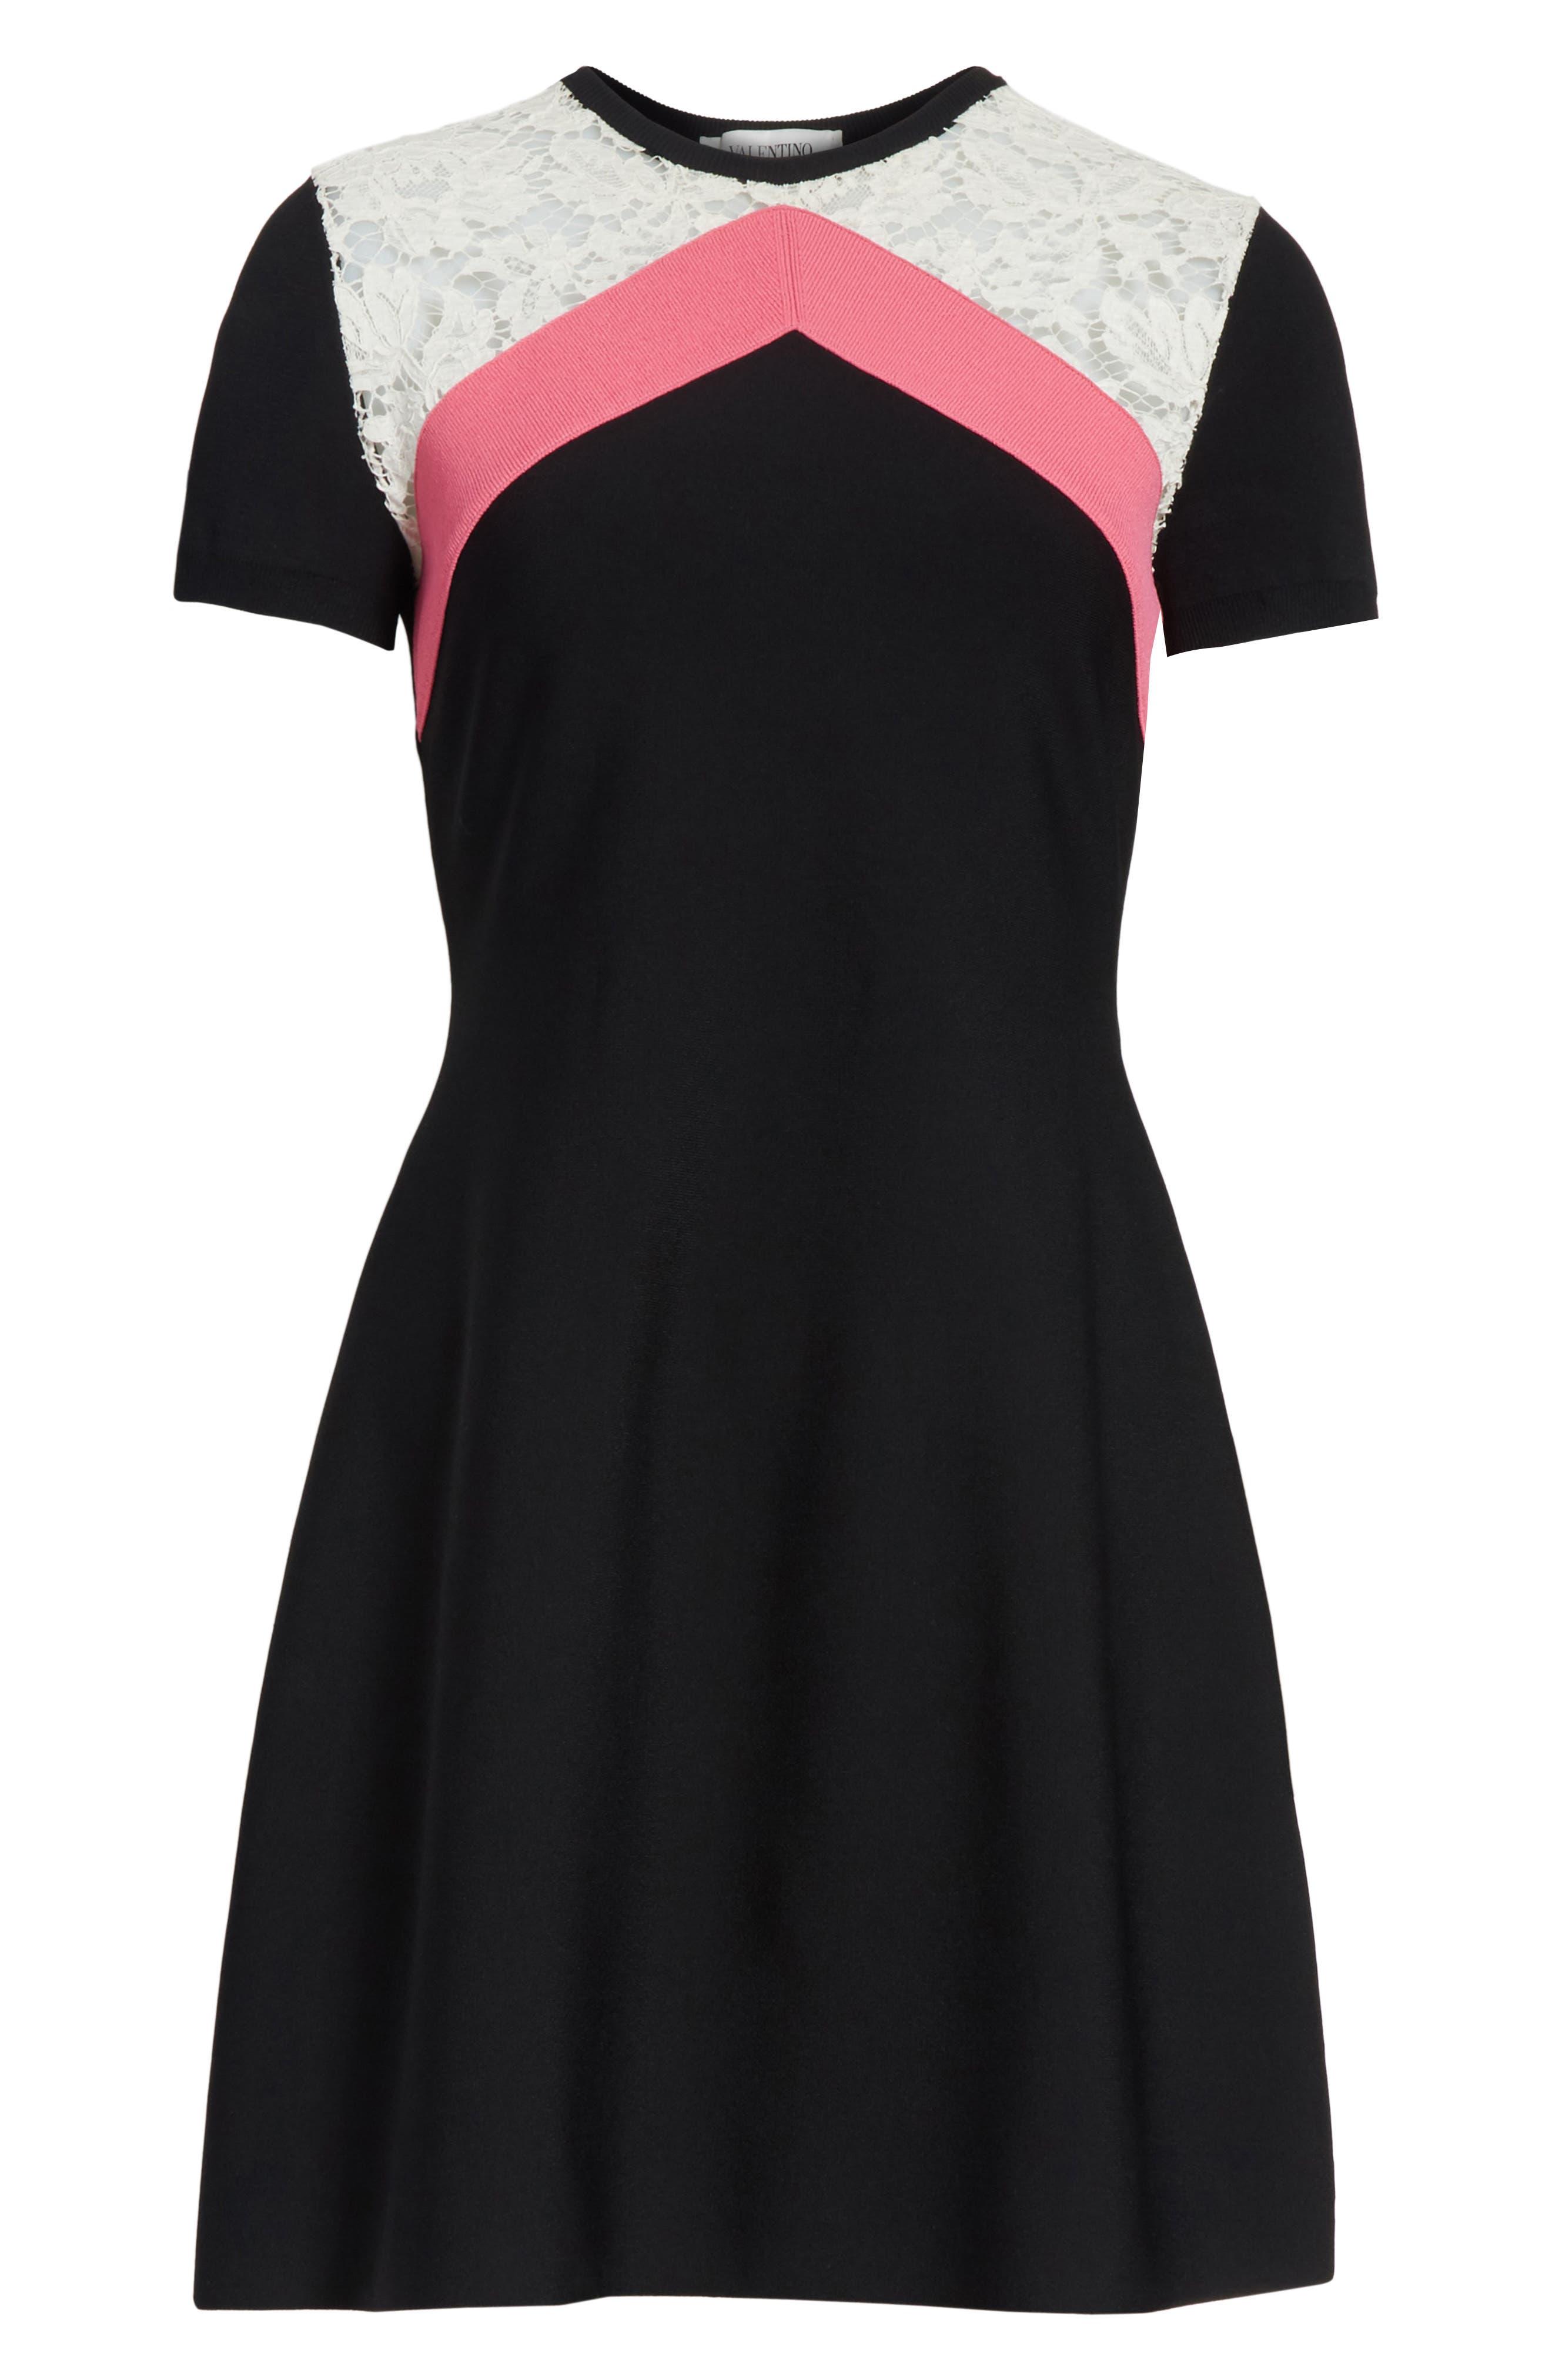 Chevron Lace Knit Dress,                             Alternate thumbnail 6, color,                             001